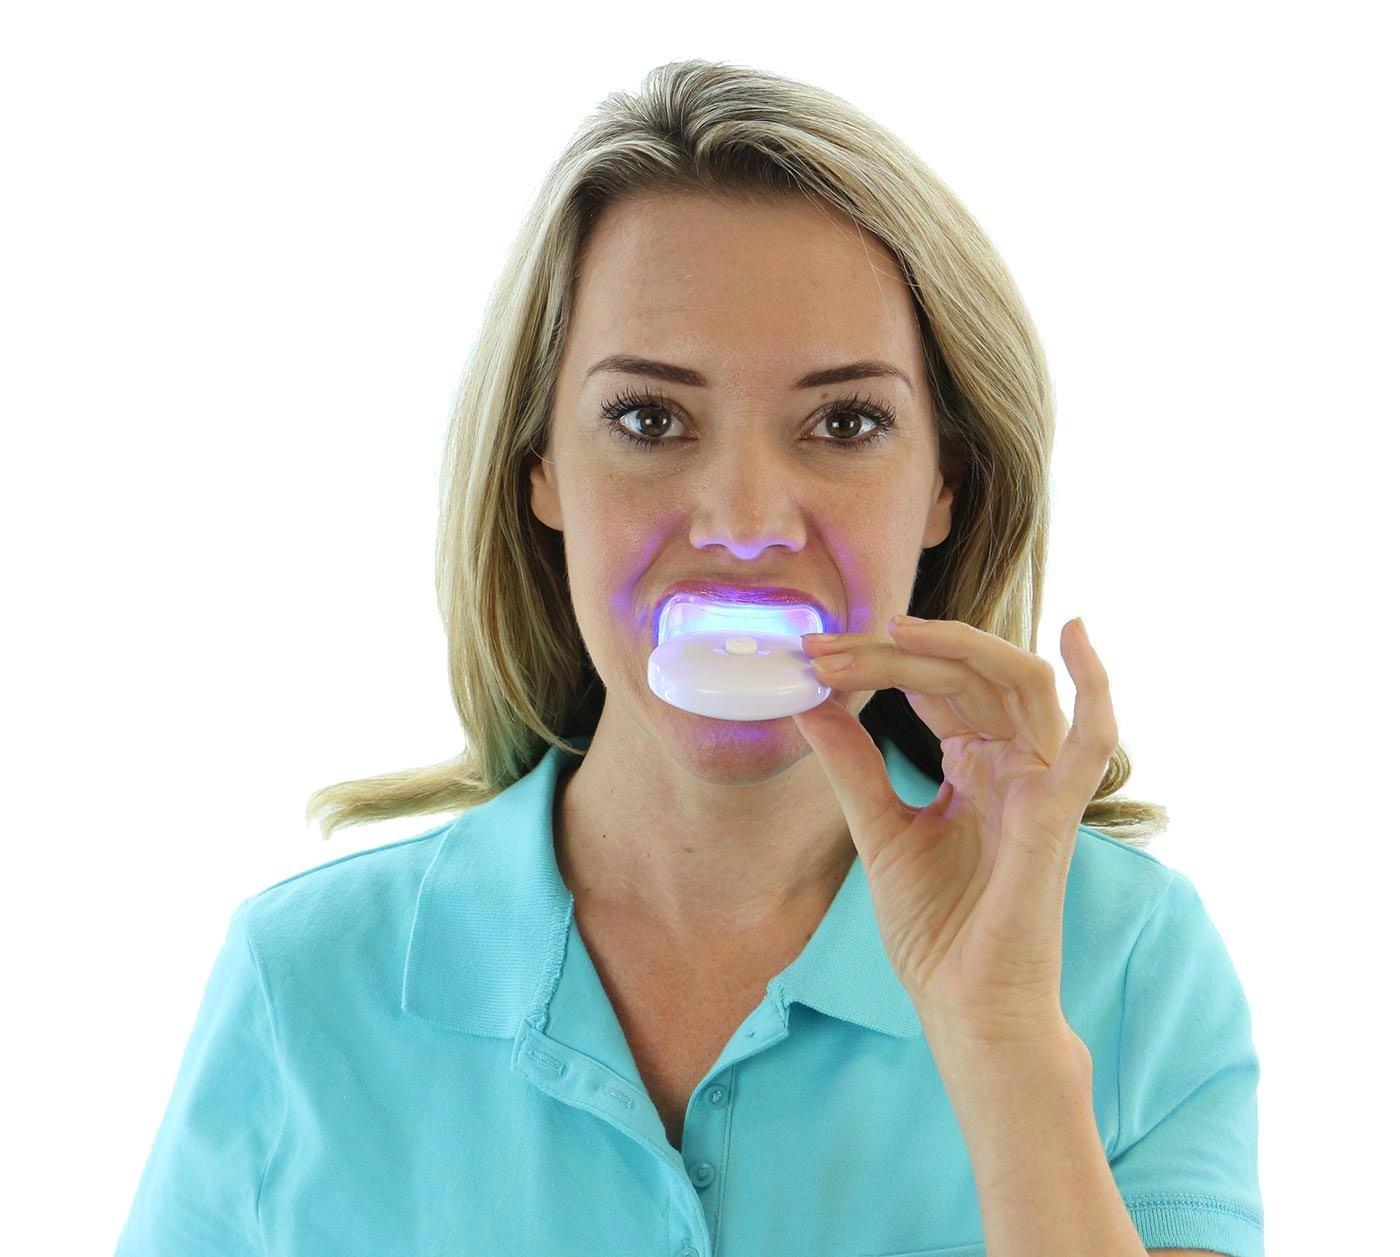 Amazoncom AuraGlow Teeth Whitening Kit LED Light Carbamide - 26 celebrity photos without teeth show keep